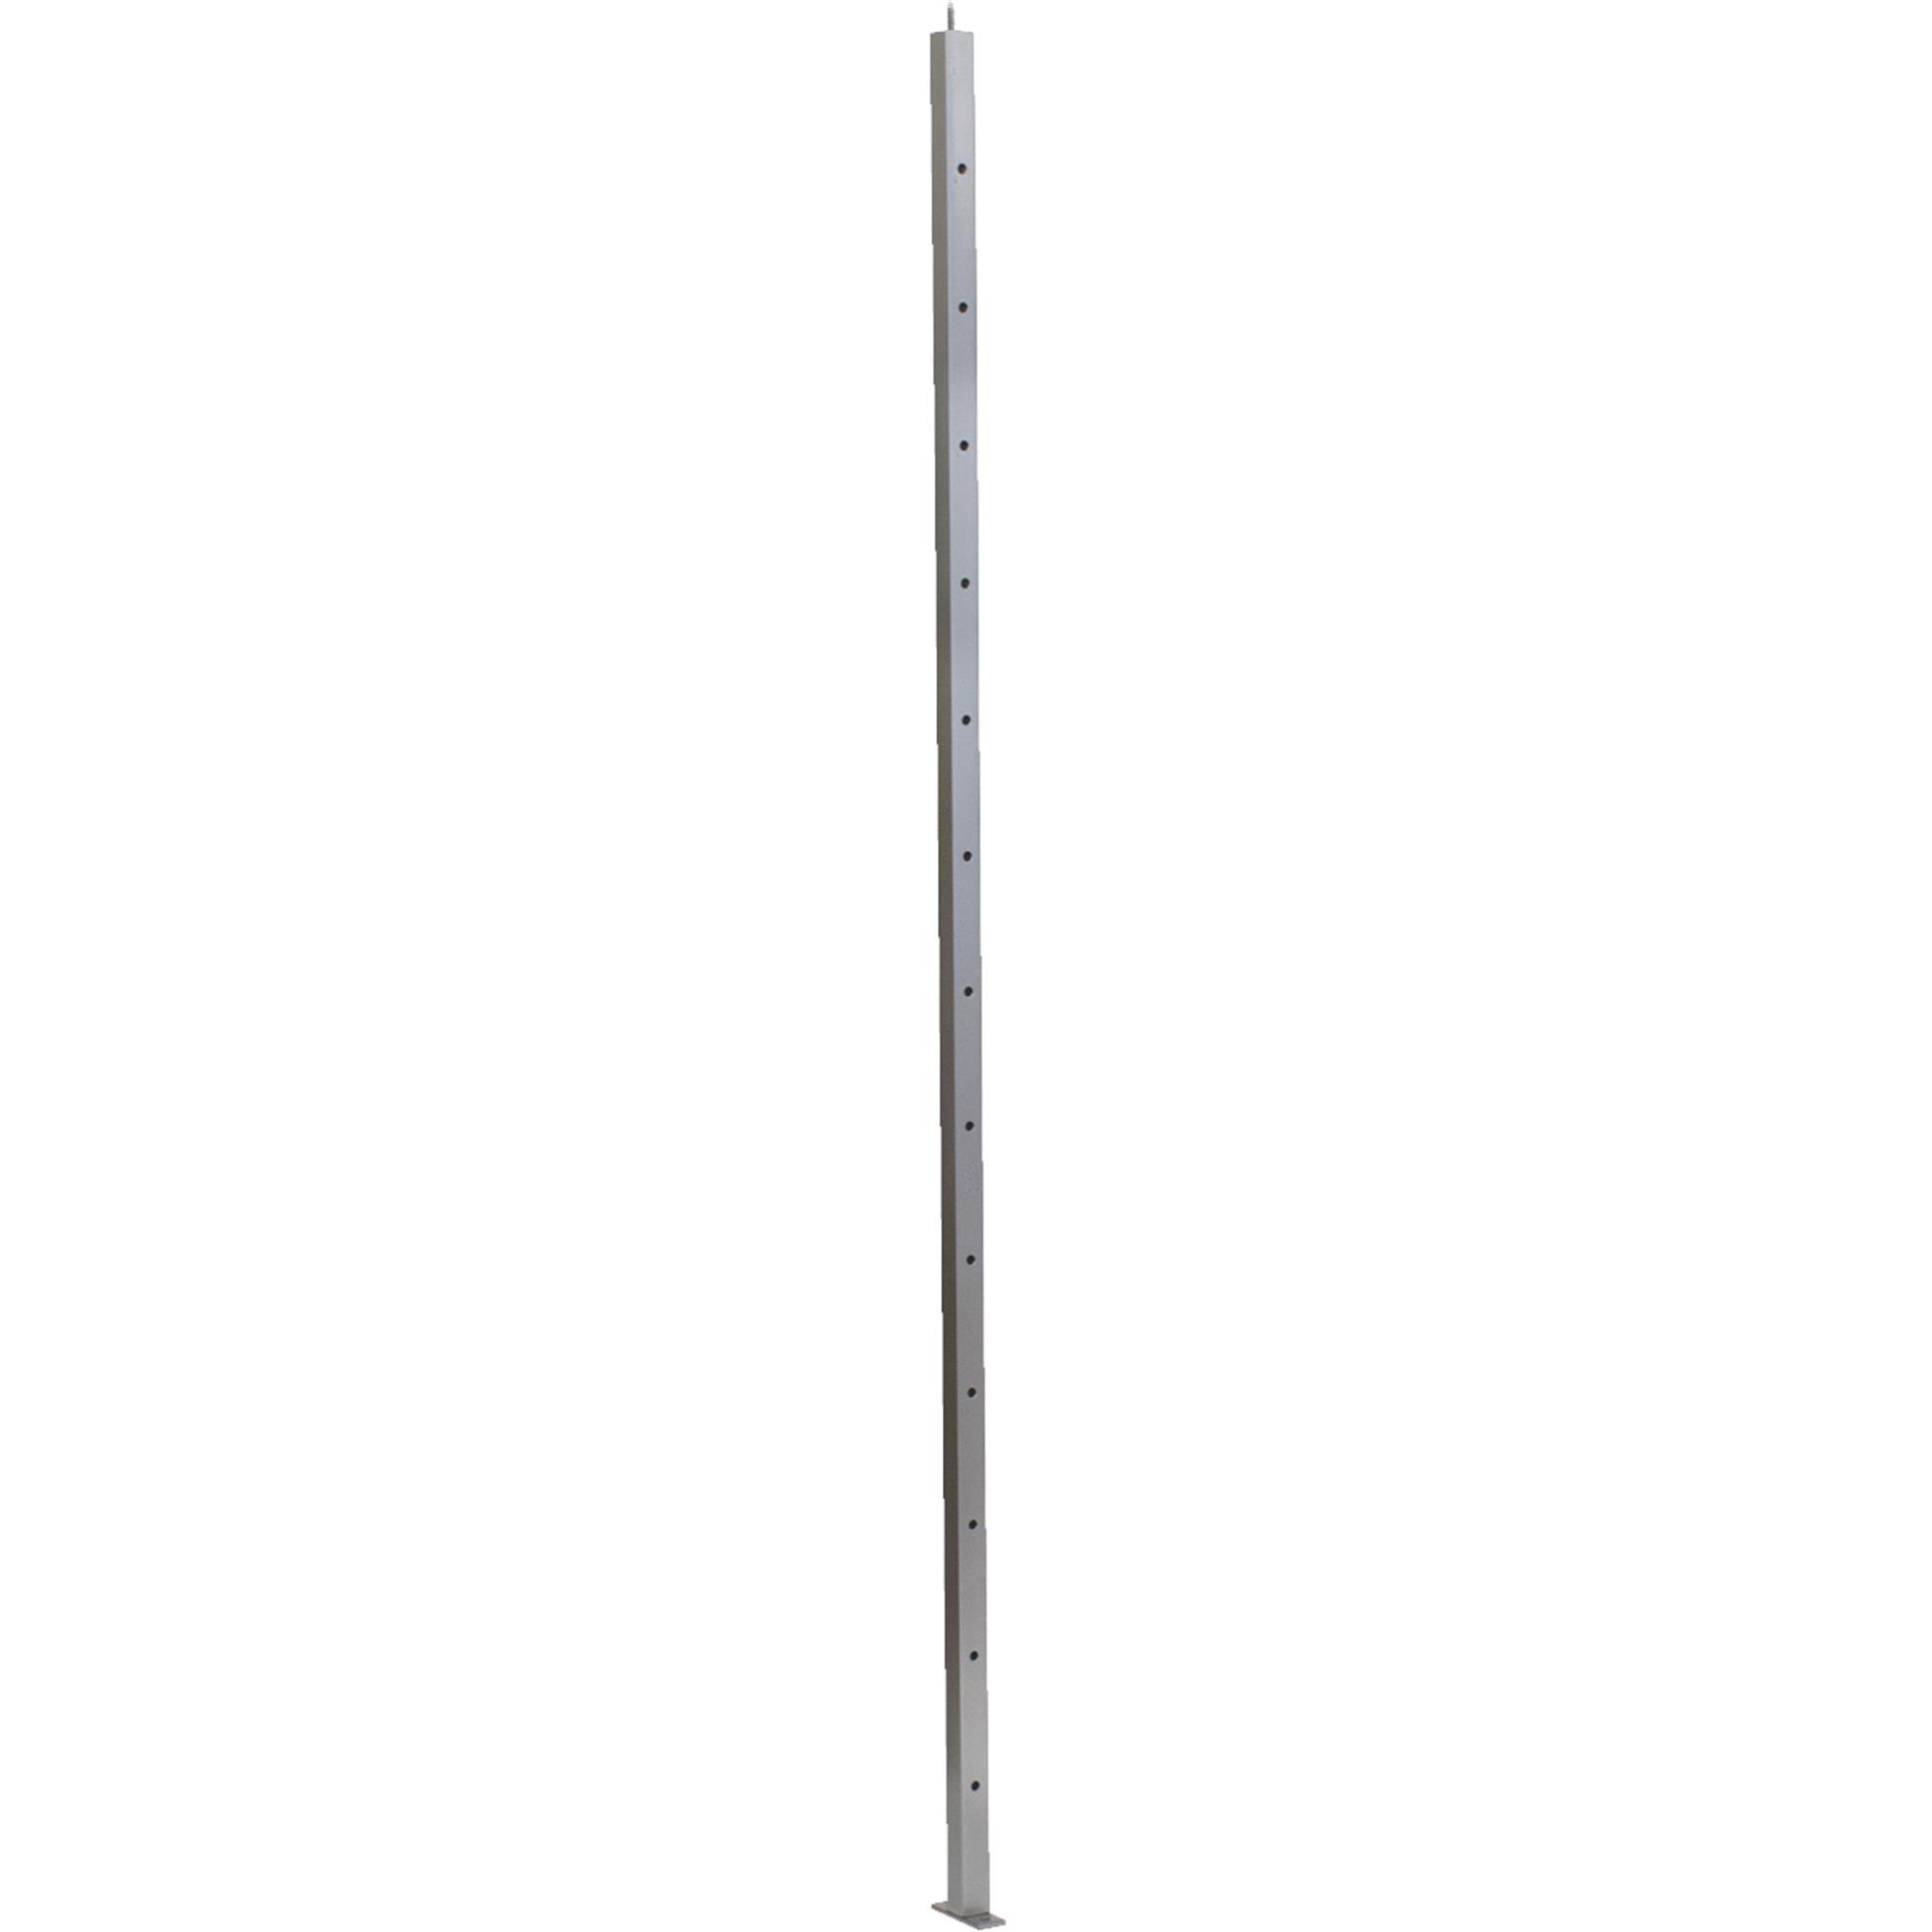 ATLANTIS RAIL SYSTEM Aluminm Cable Stabilizer A0908 MT60 C   Walmart.com